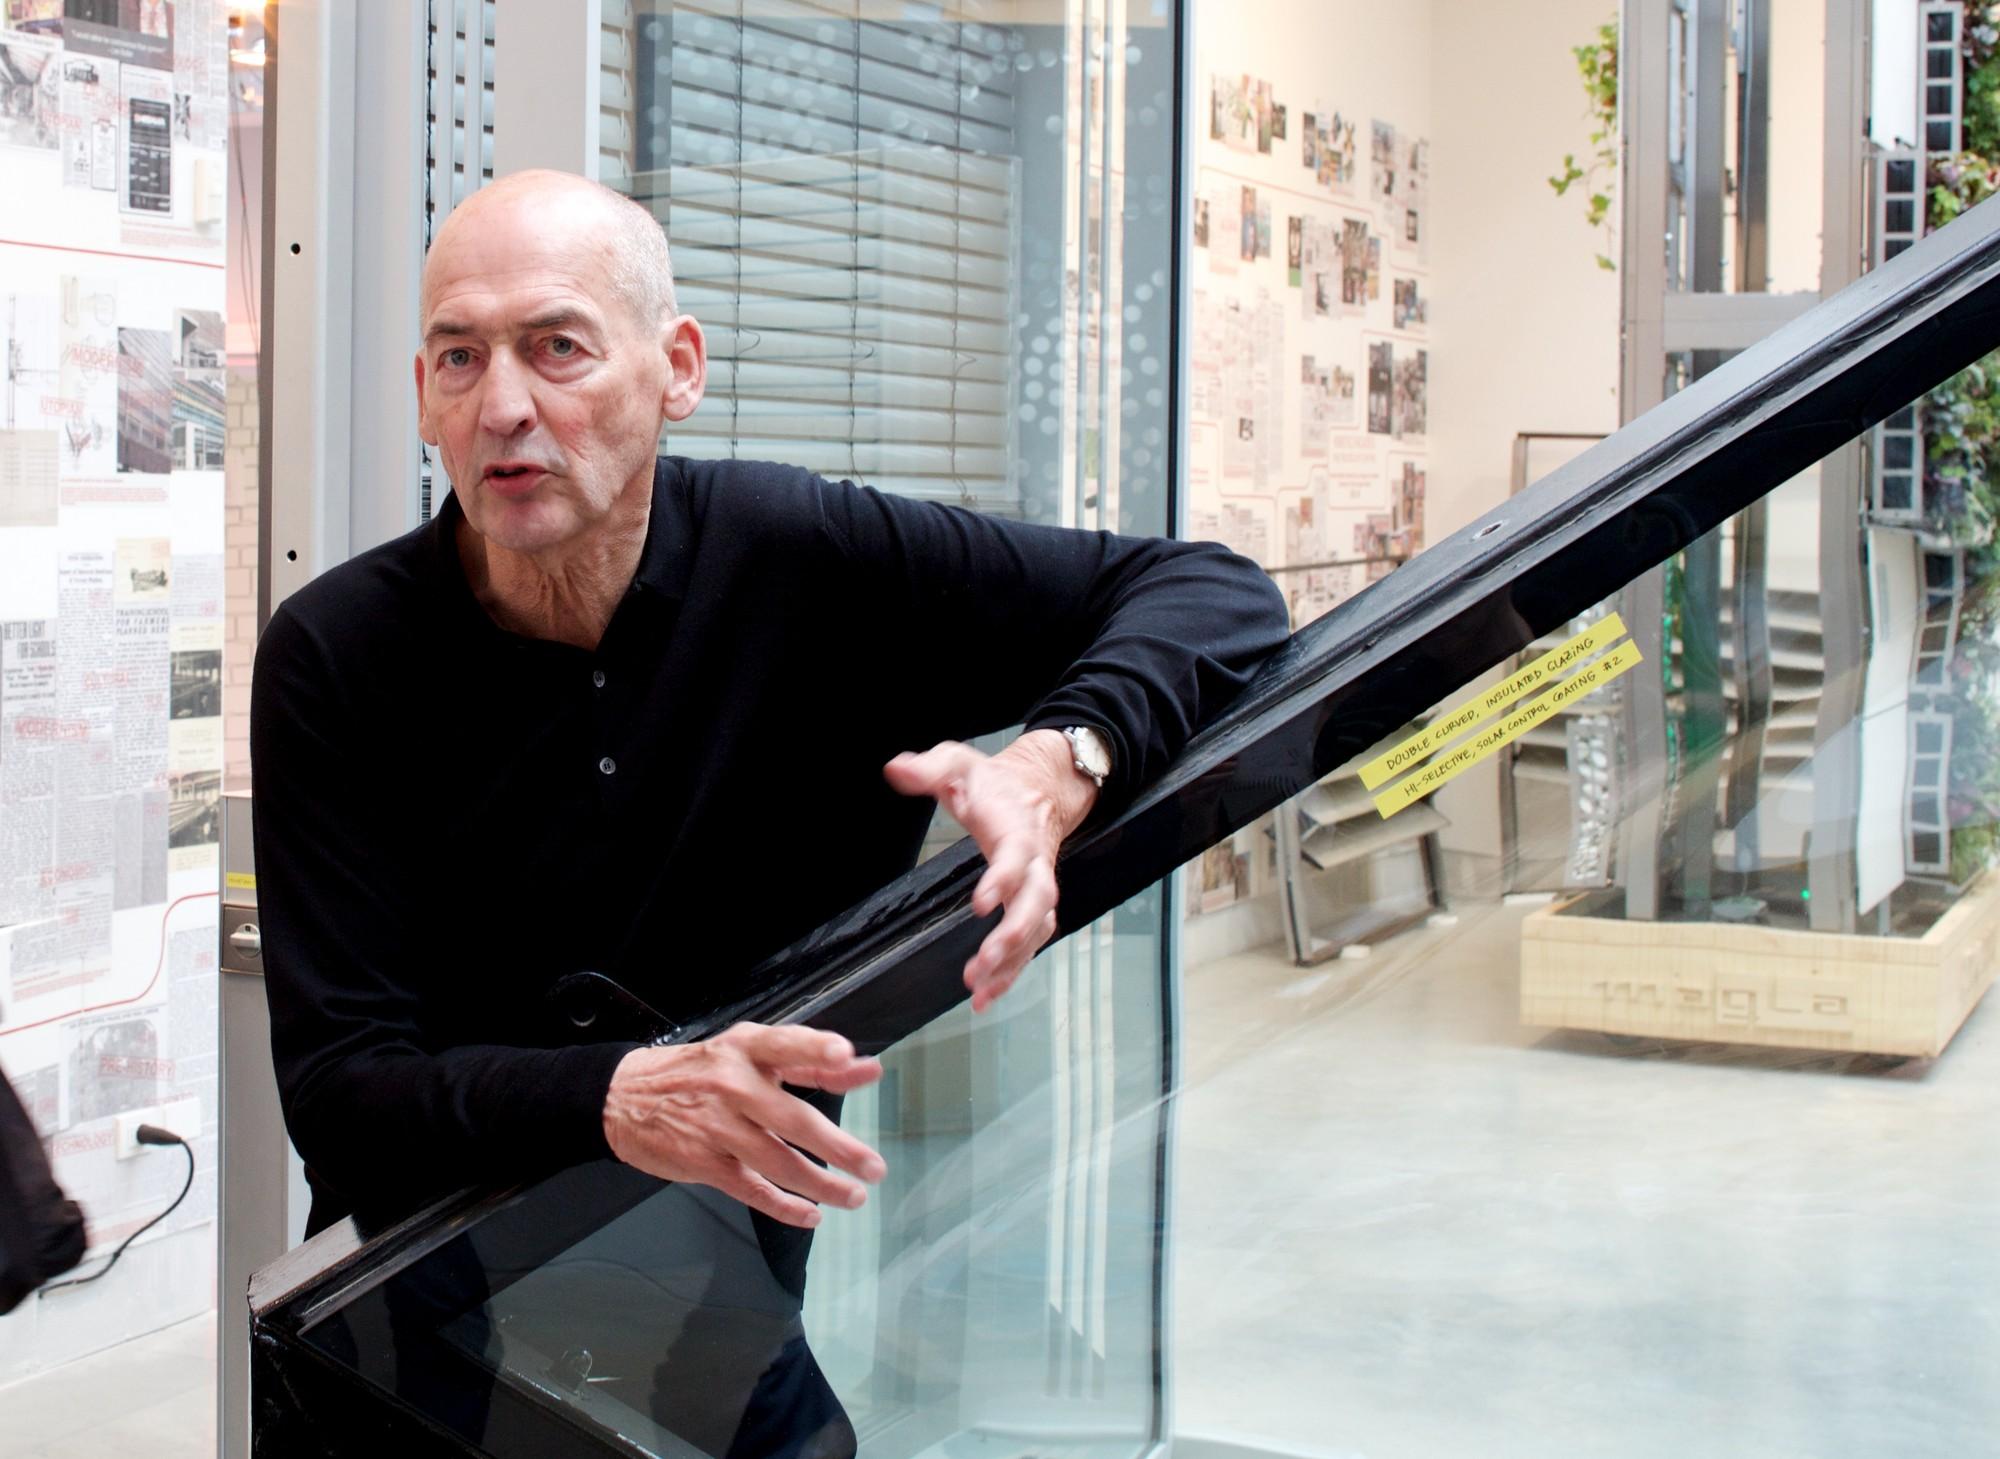 Plataforma Arquitectura en la Bienal de Venecia 2014, Rem Koolhaas en Elements © ArchDaily